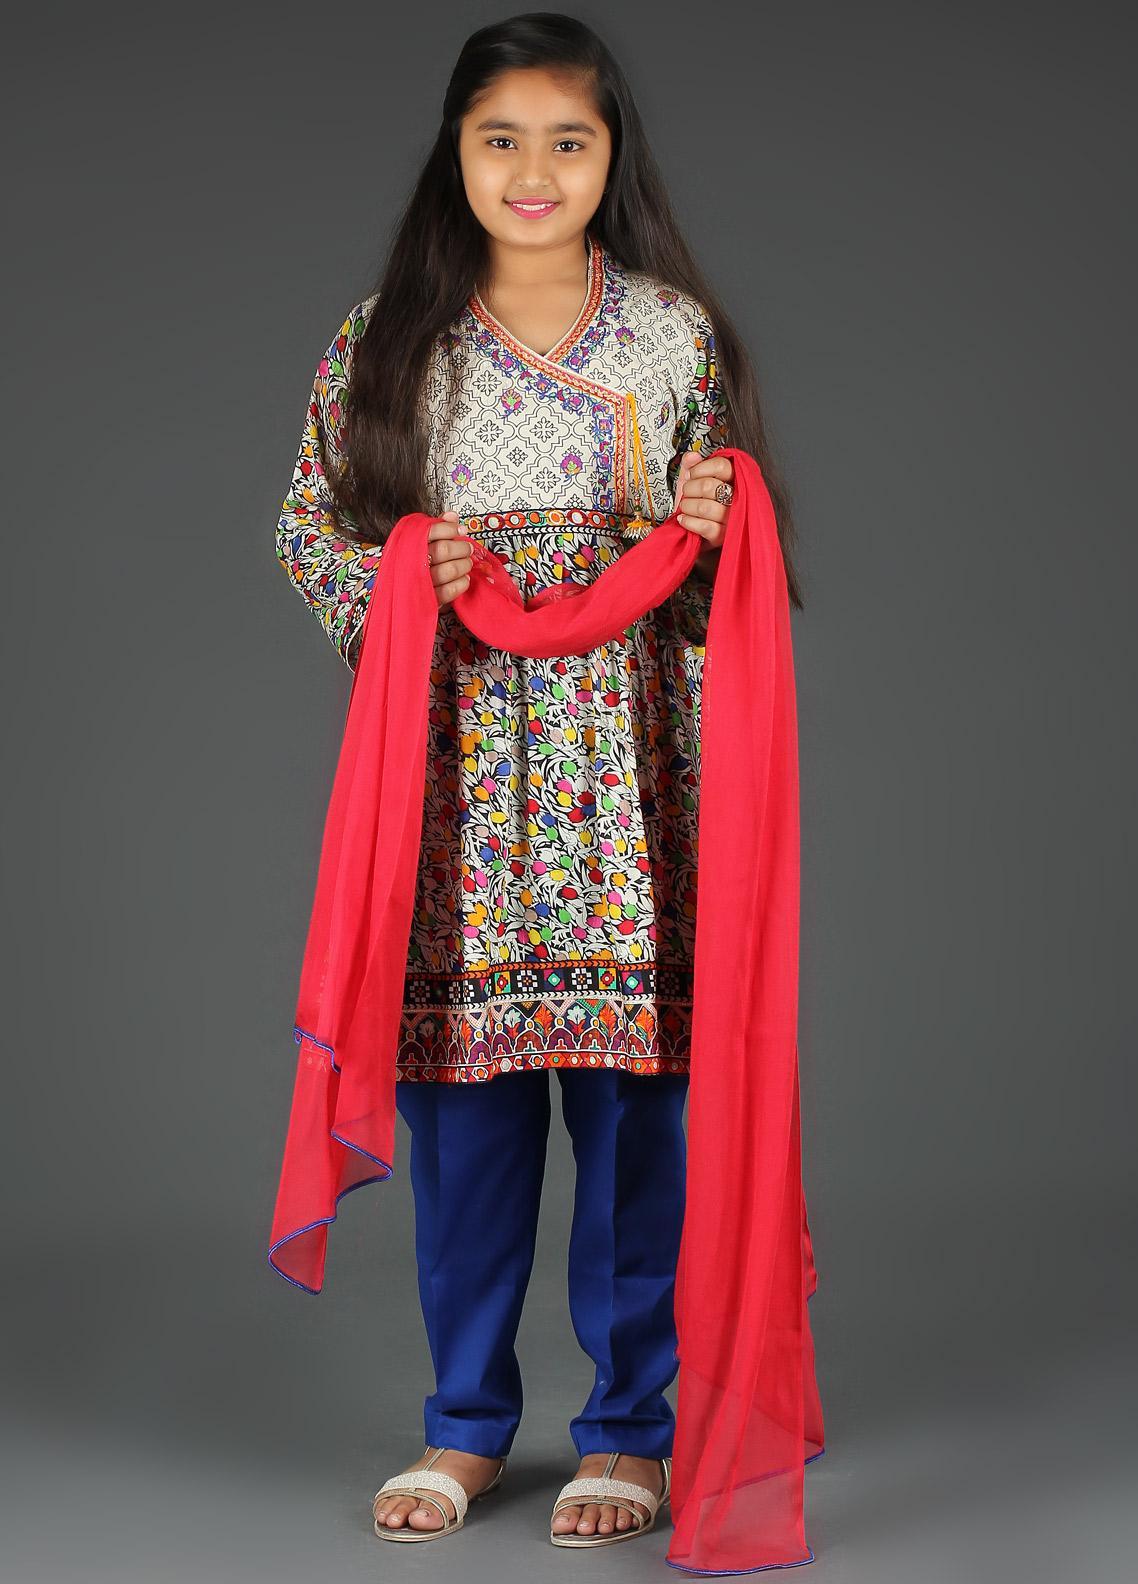 Sanaulla Exclusive Range Cotton Embroidered Girls 3 Piece Suits -  5411G Blue